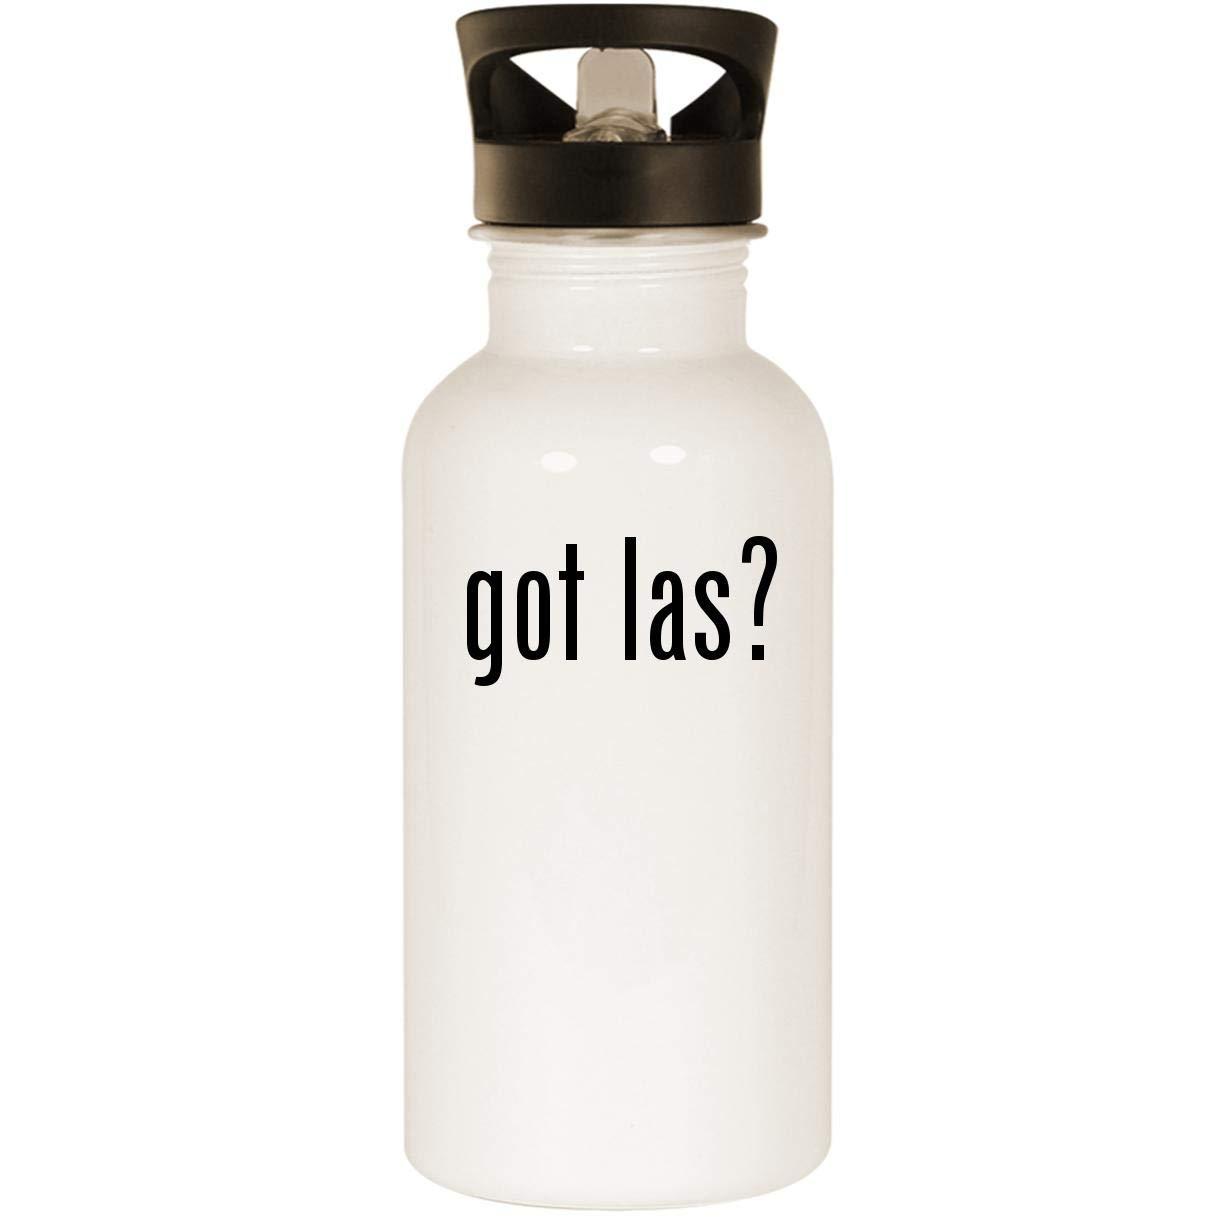 got las? - Stainless Steel 20oz Road Ready Water Bottle, White